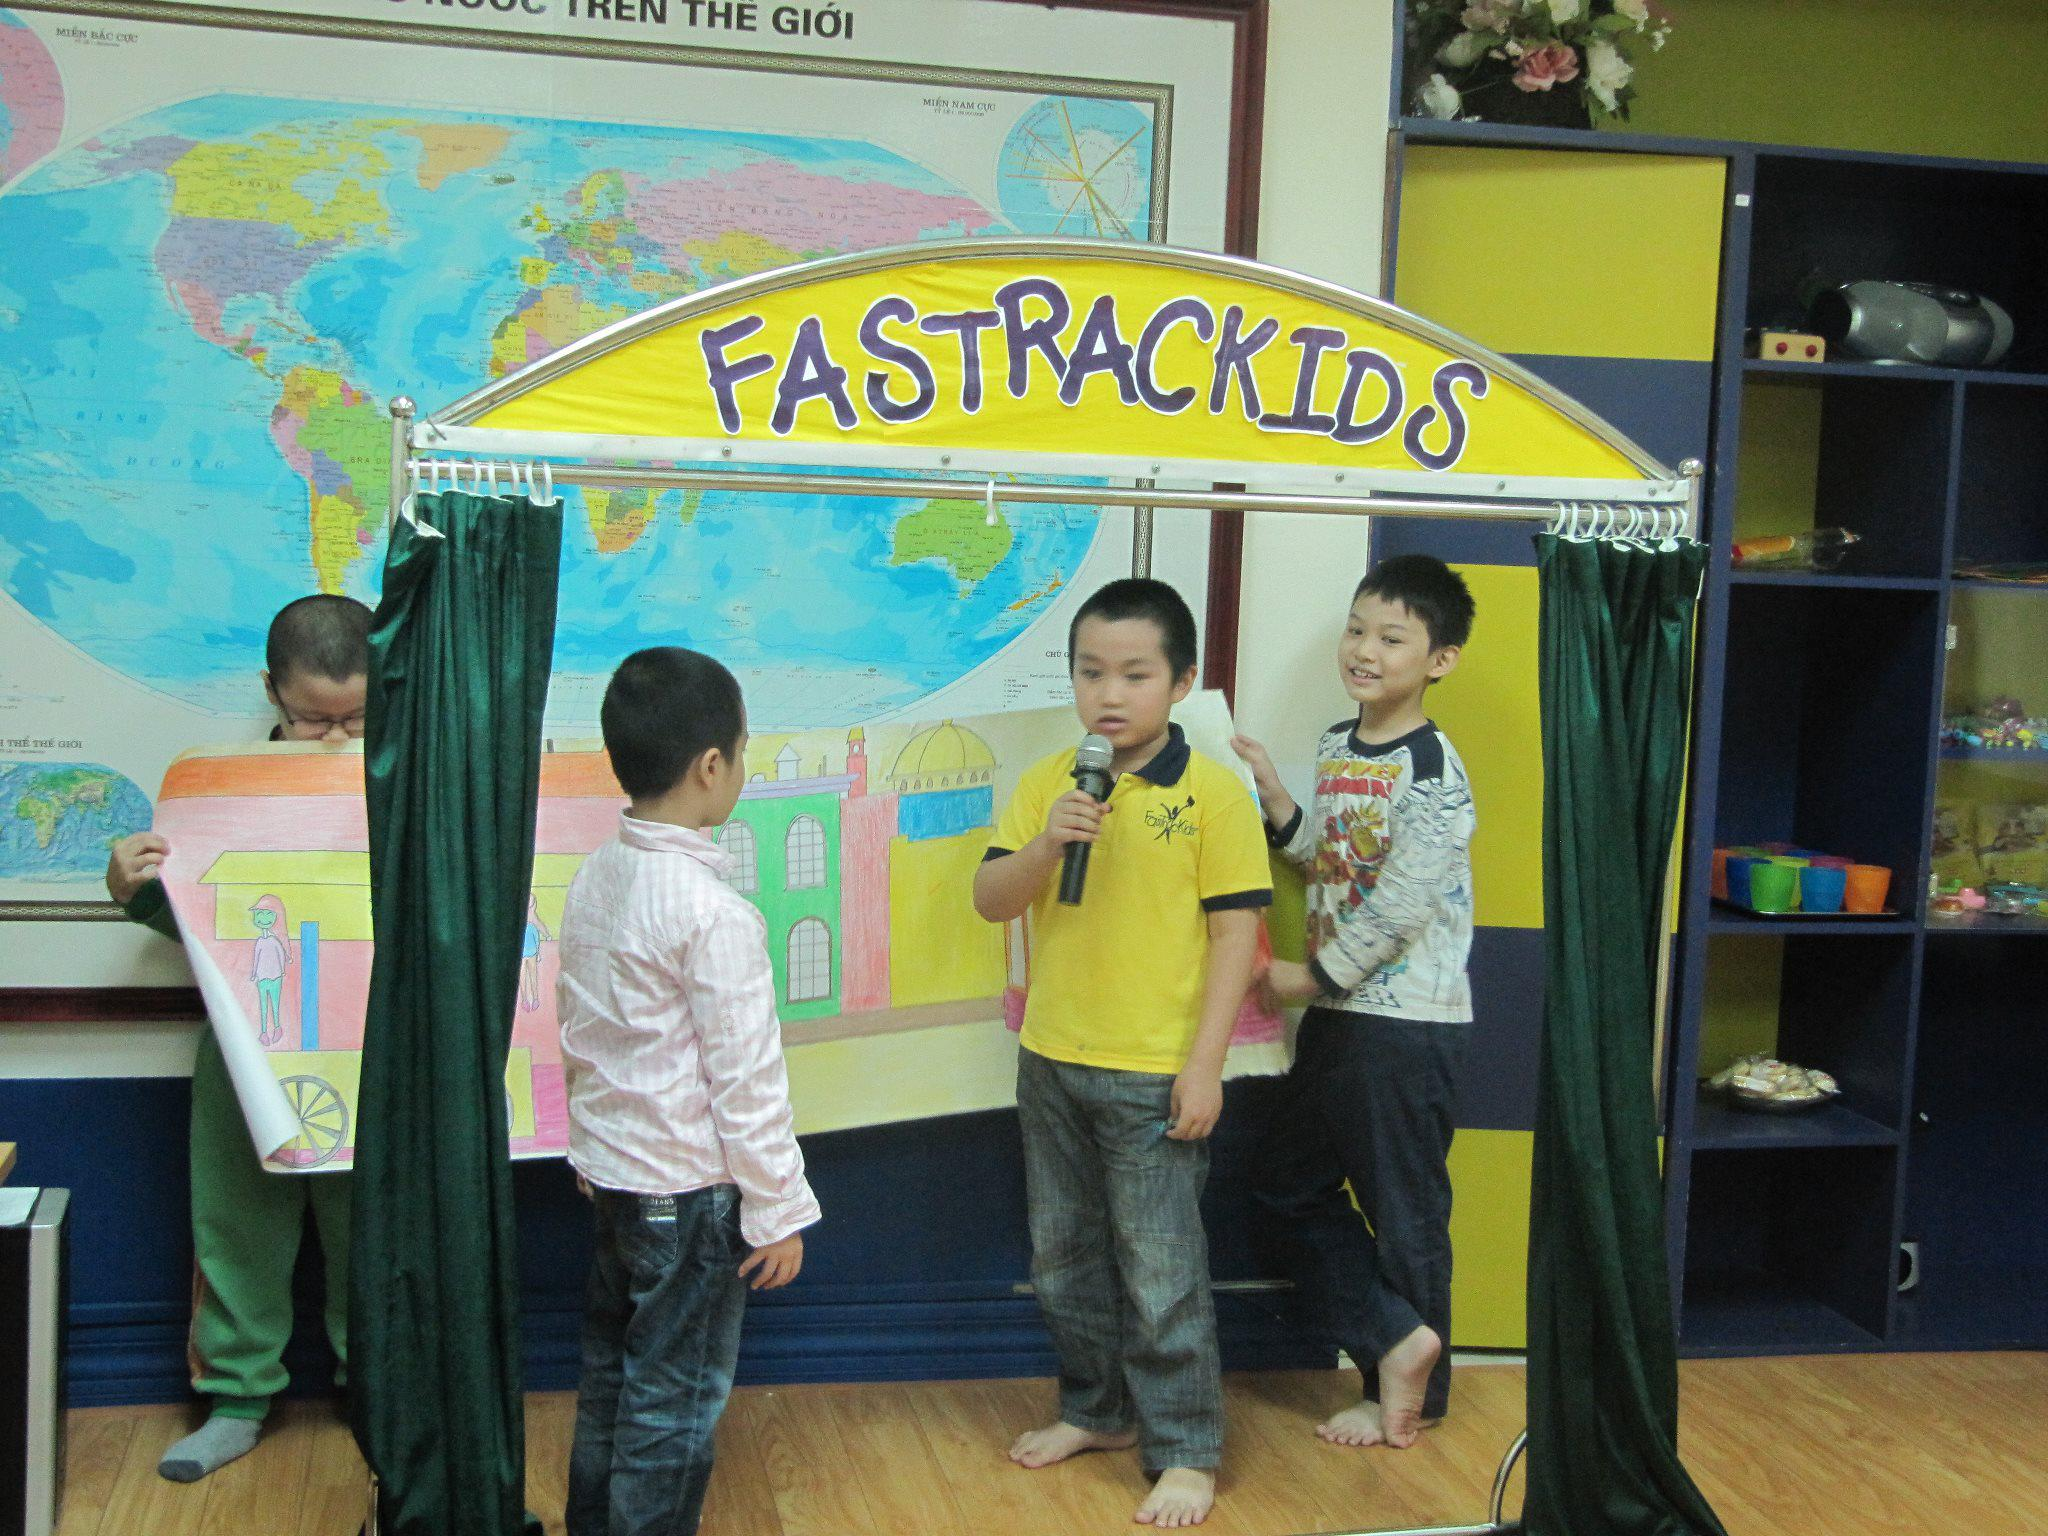 Metodologie FasTracKids